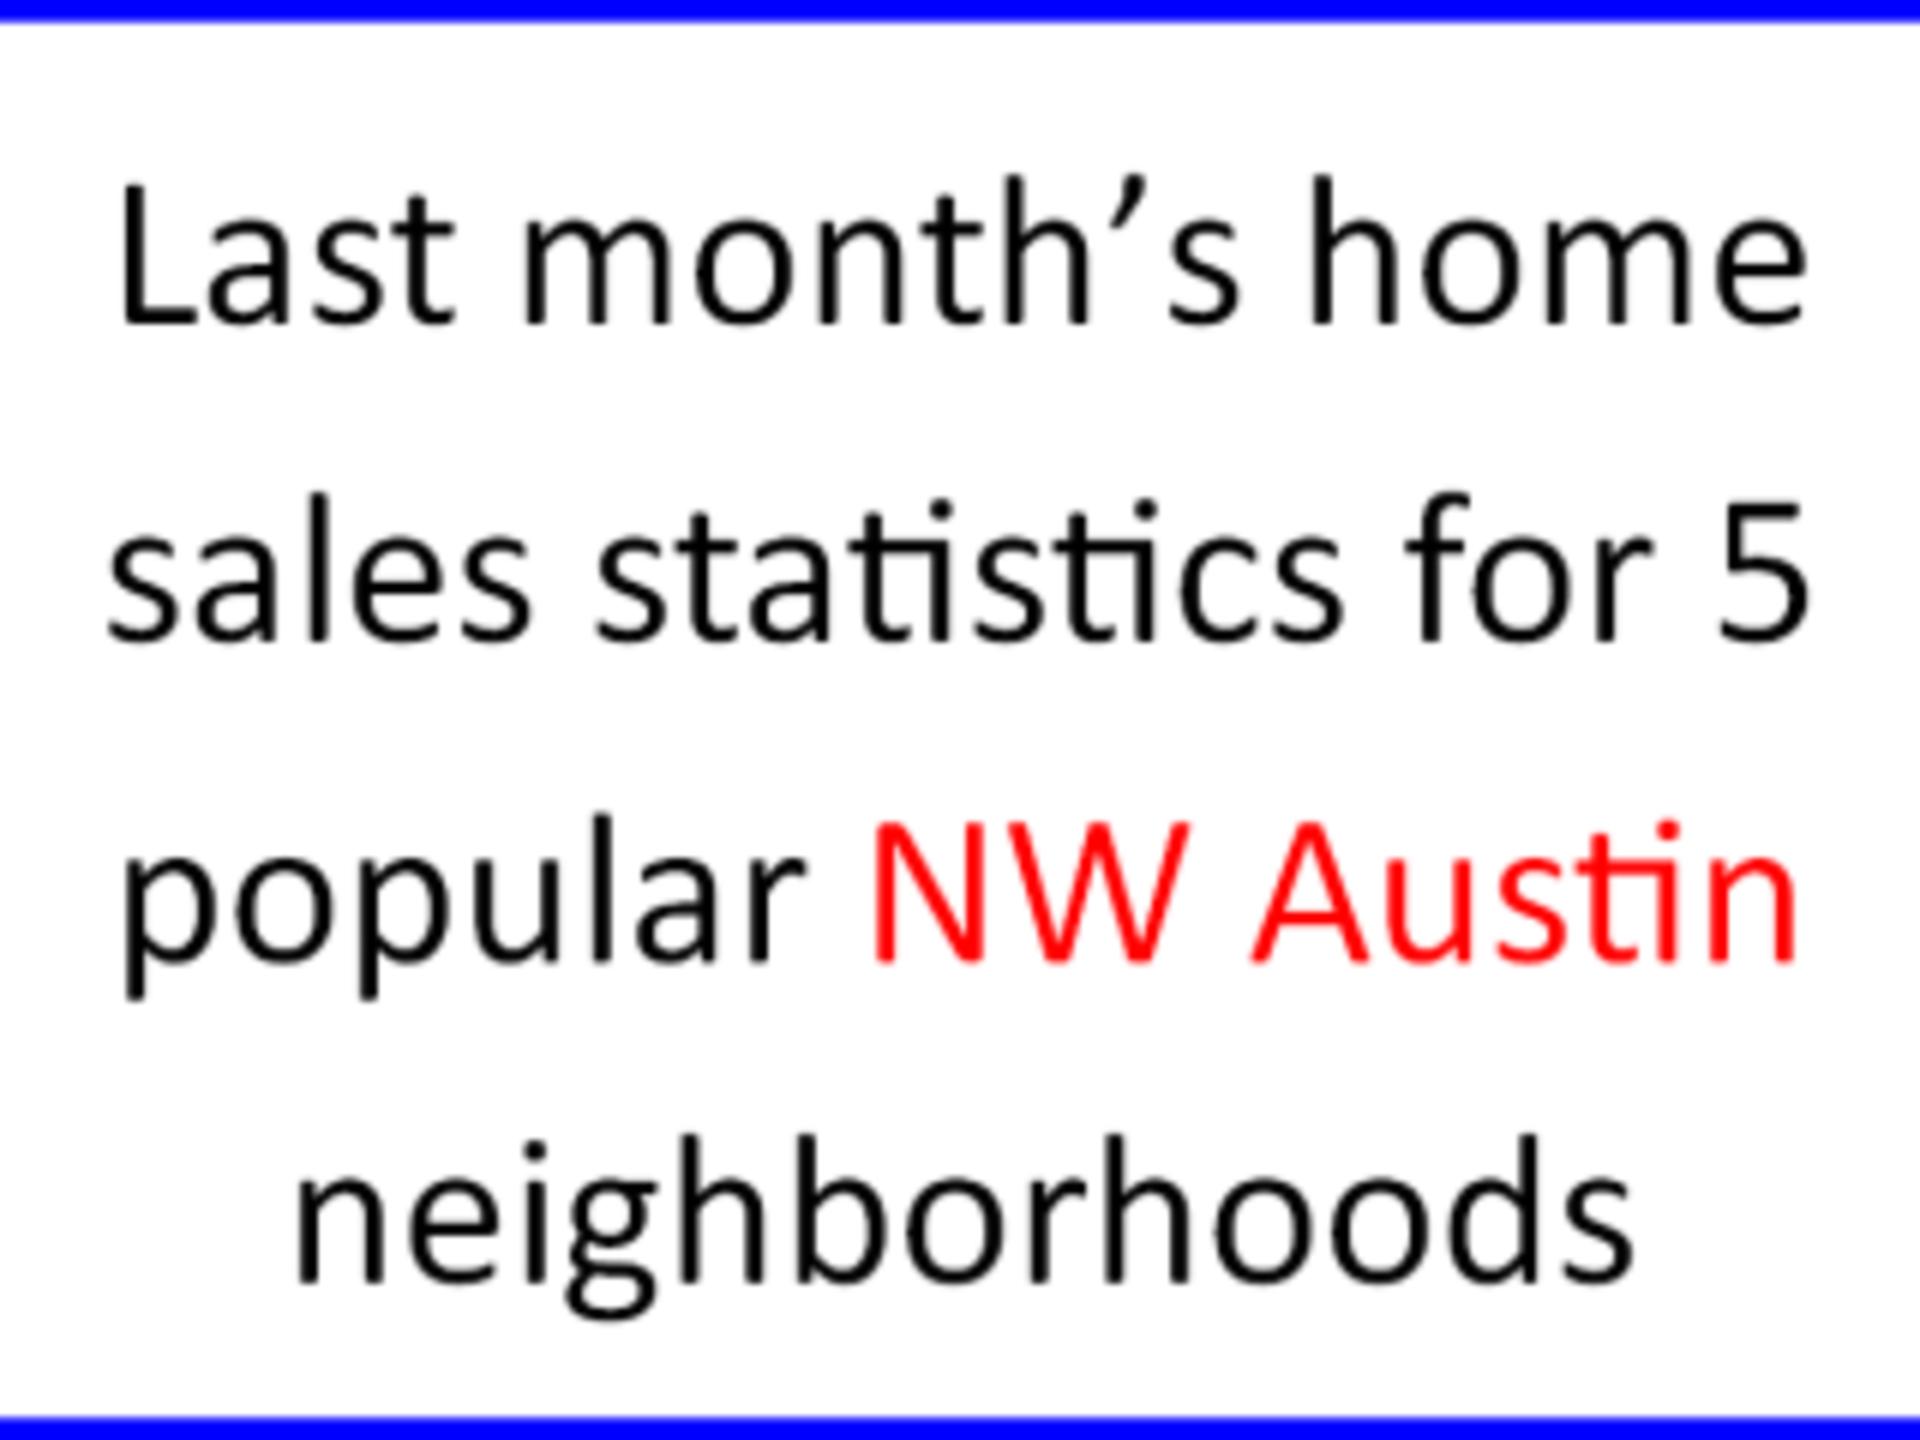 December home sales for 5 popular NW Austin neighborhoods